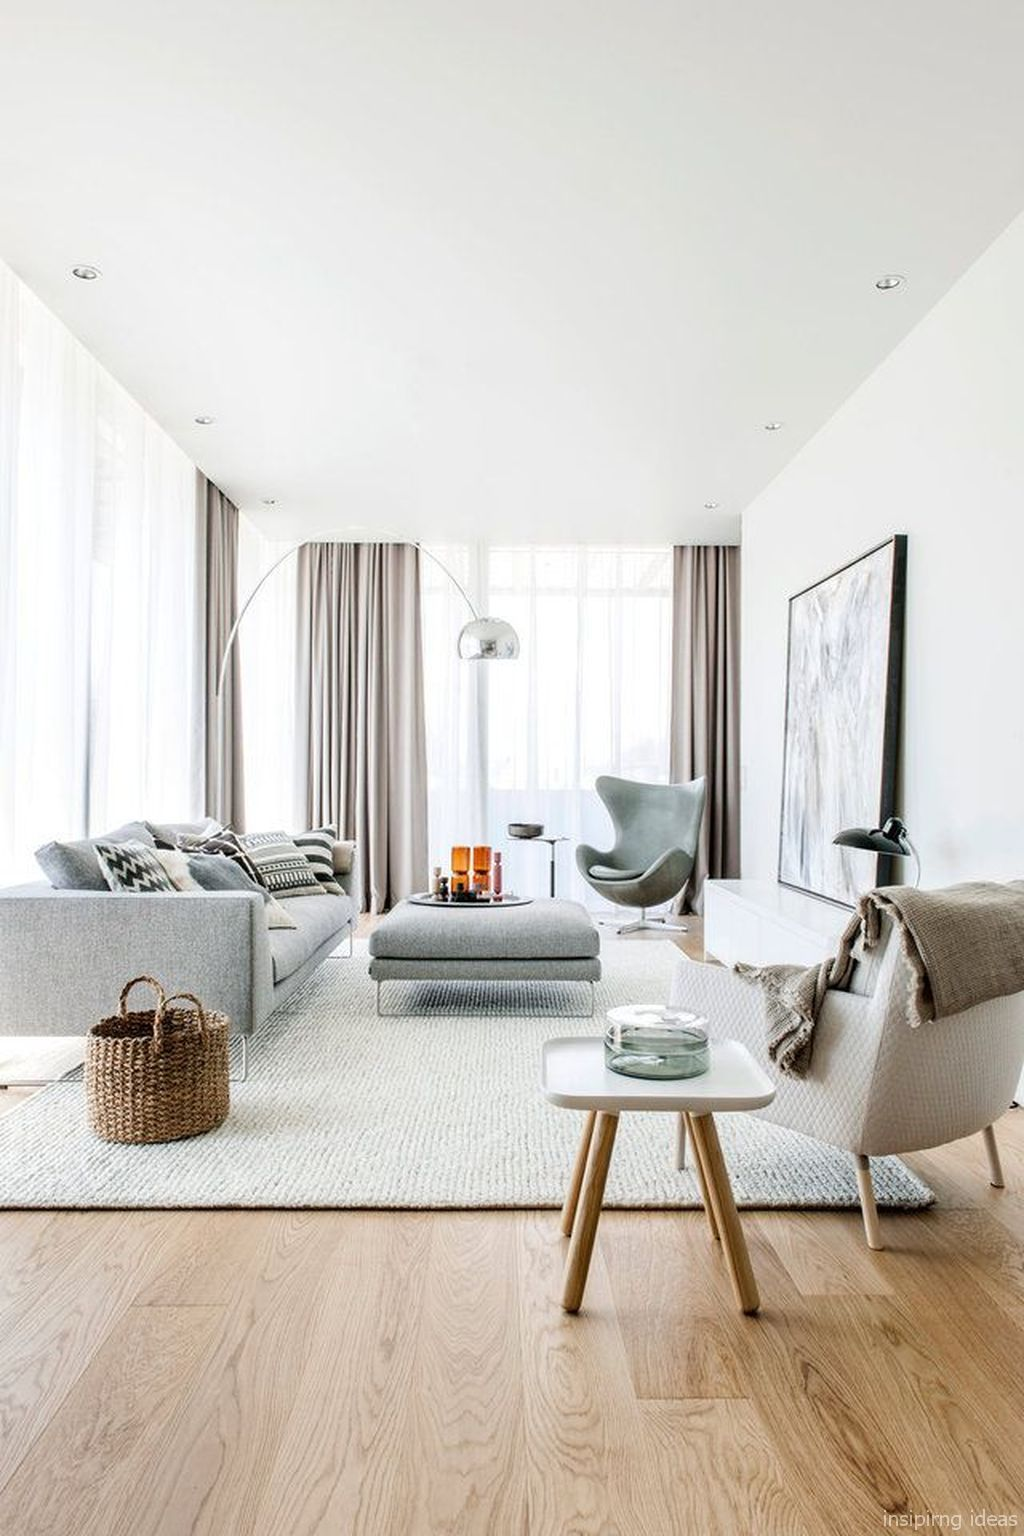 70 beautiful living room decorating ideas living room ideas rh pinterest com